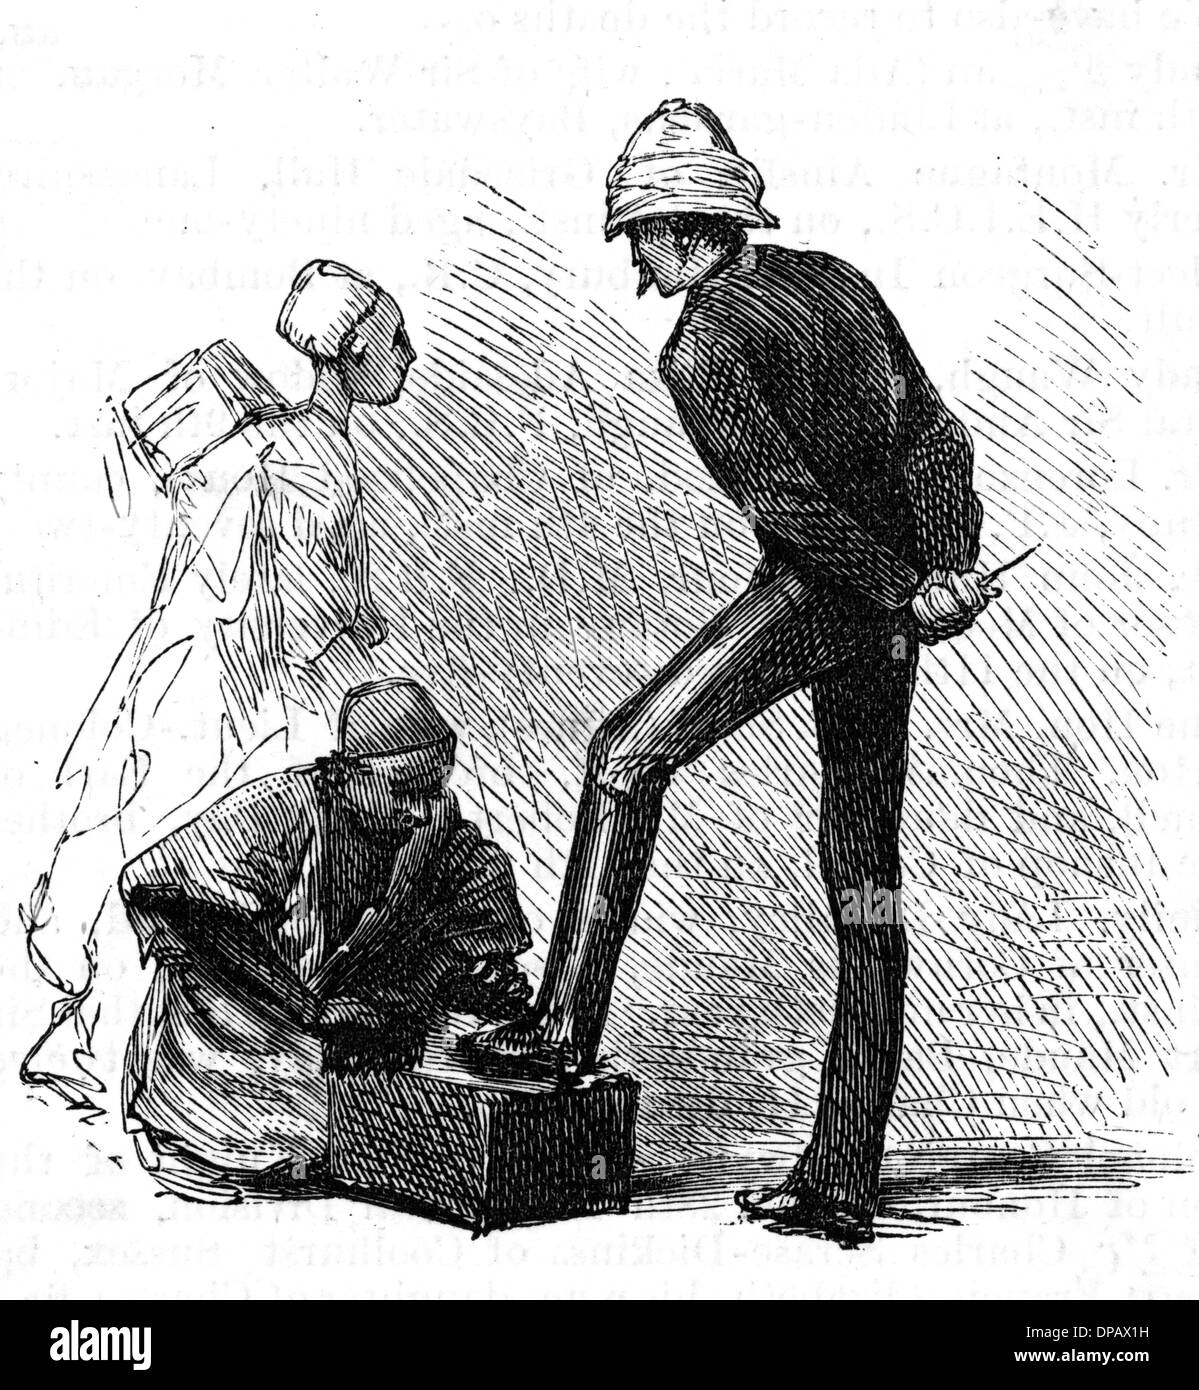 SHOES POLISHED, CAIRO - Stock Image